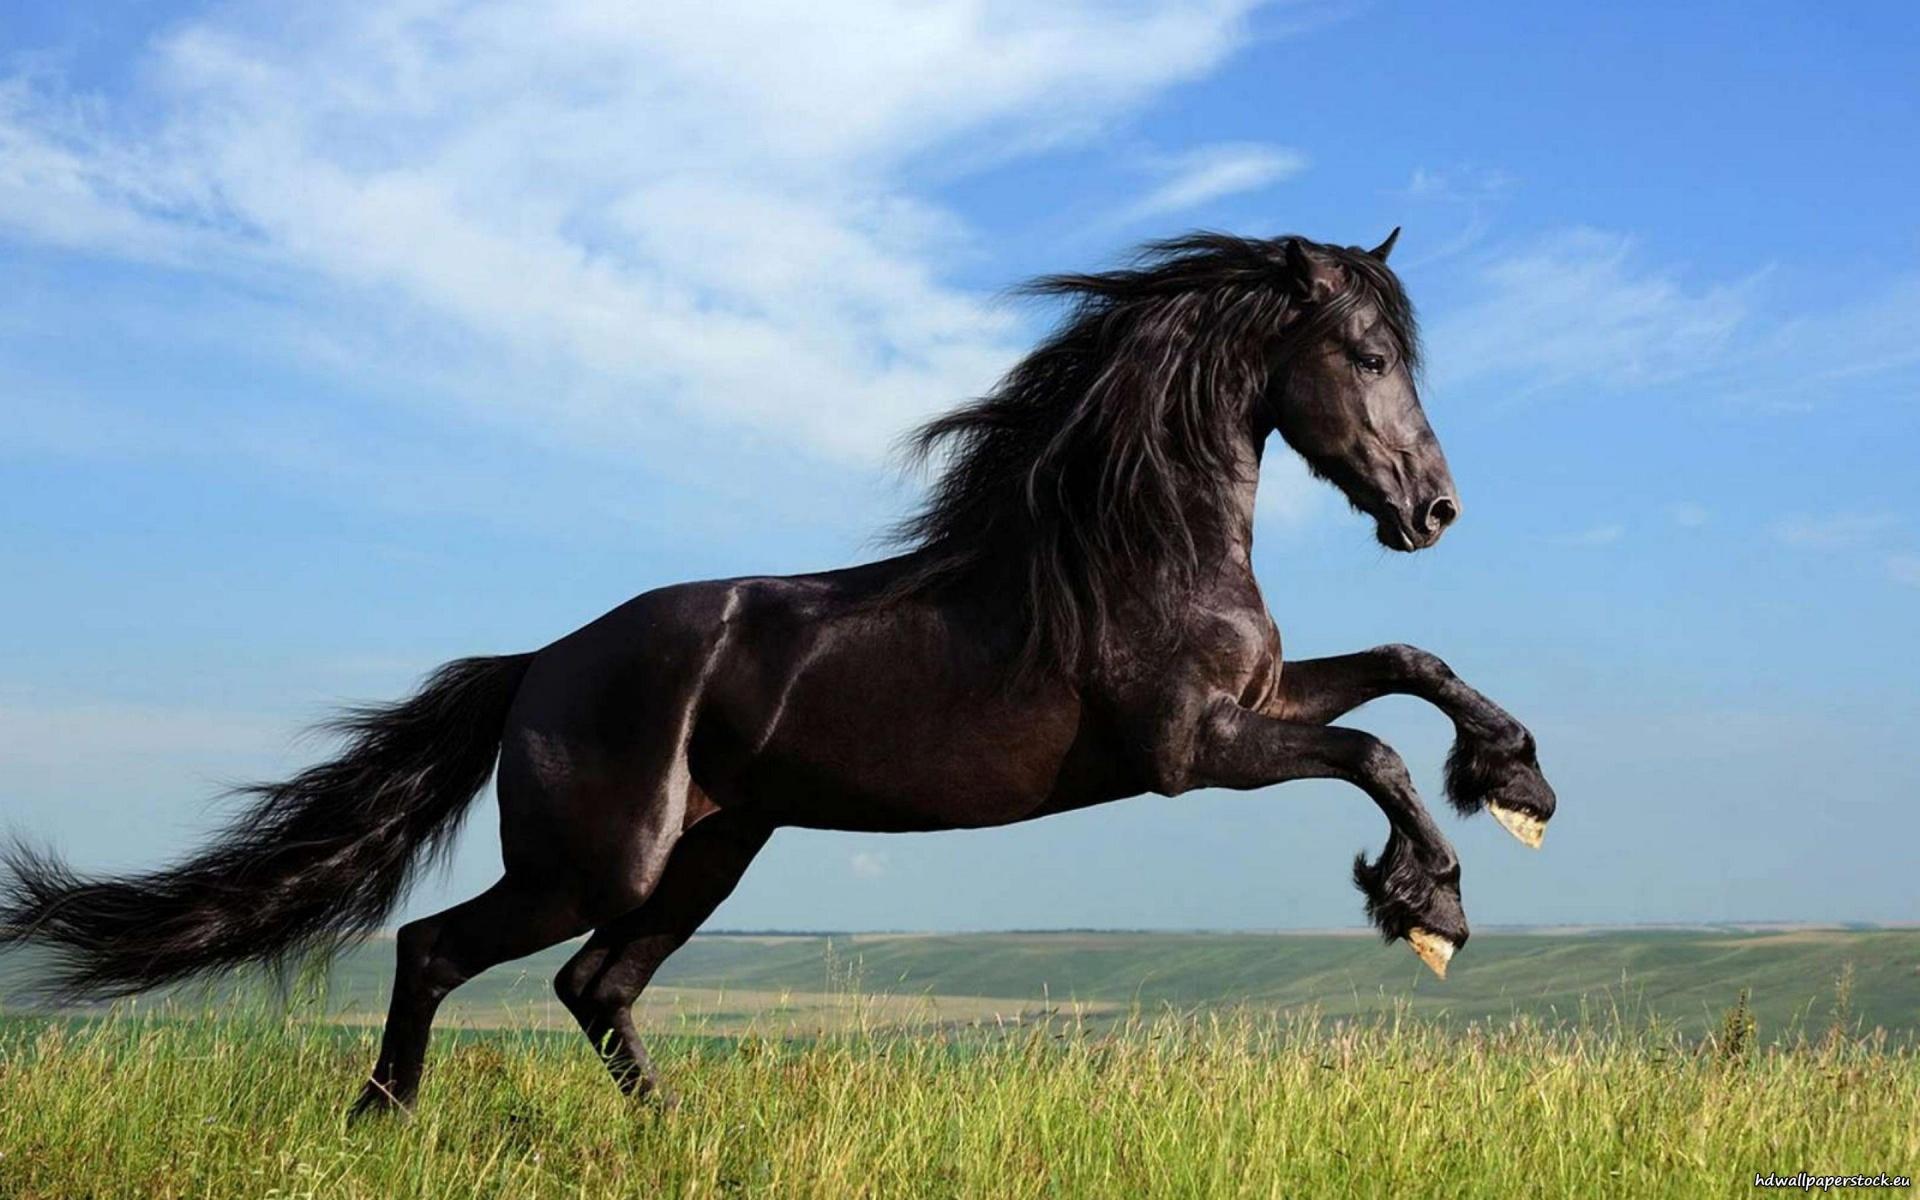 image - jumping-black-horse-hd-wallpapers-cool-desktop-background